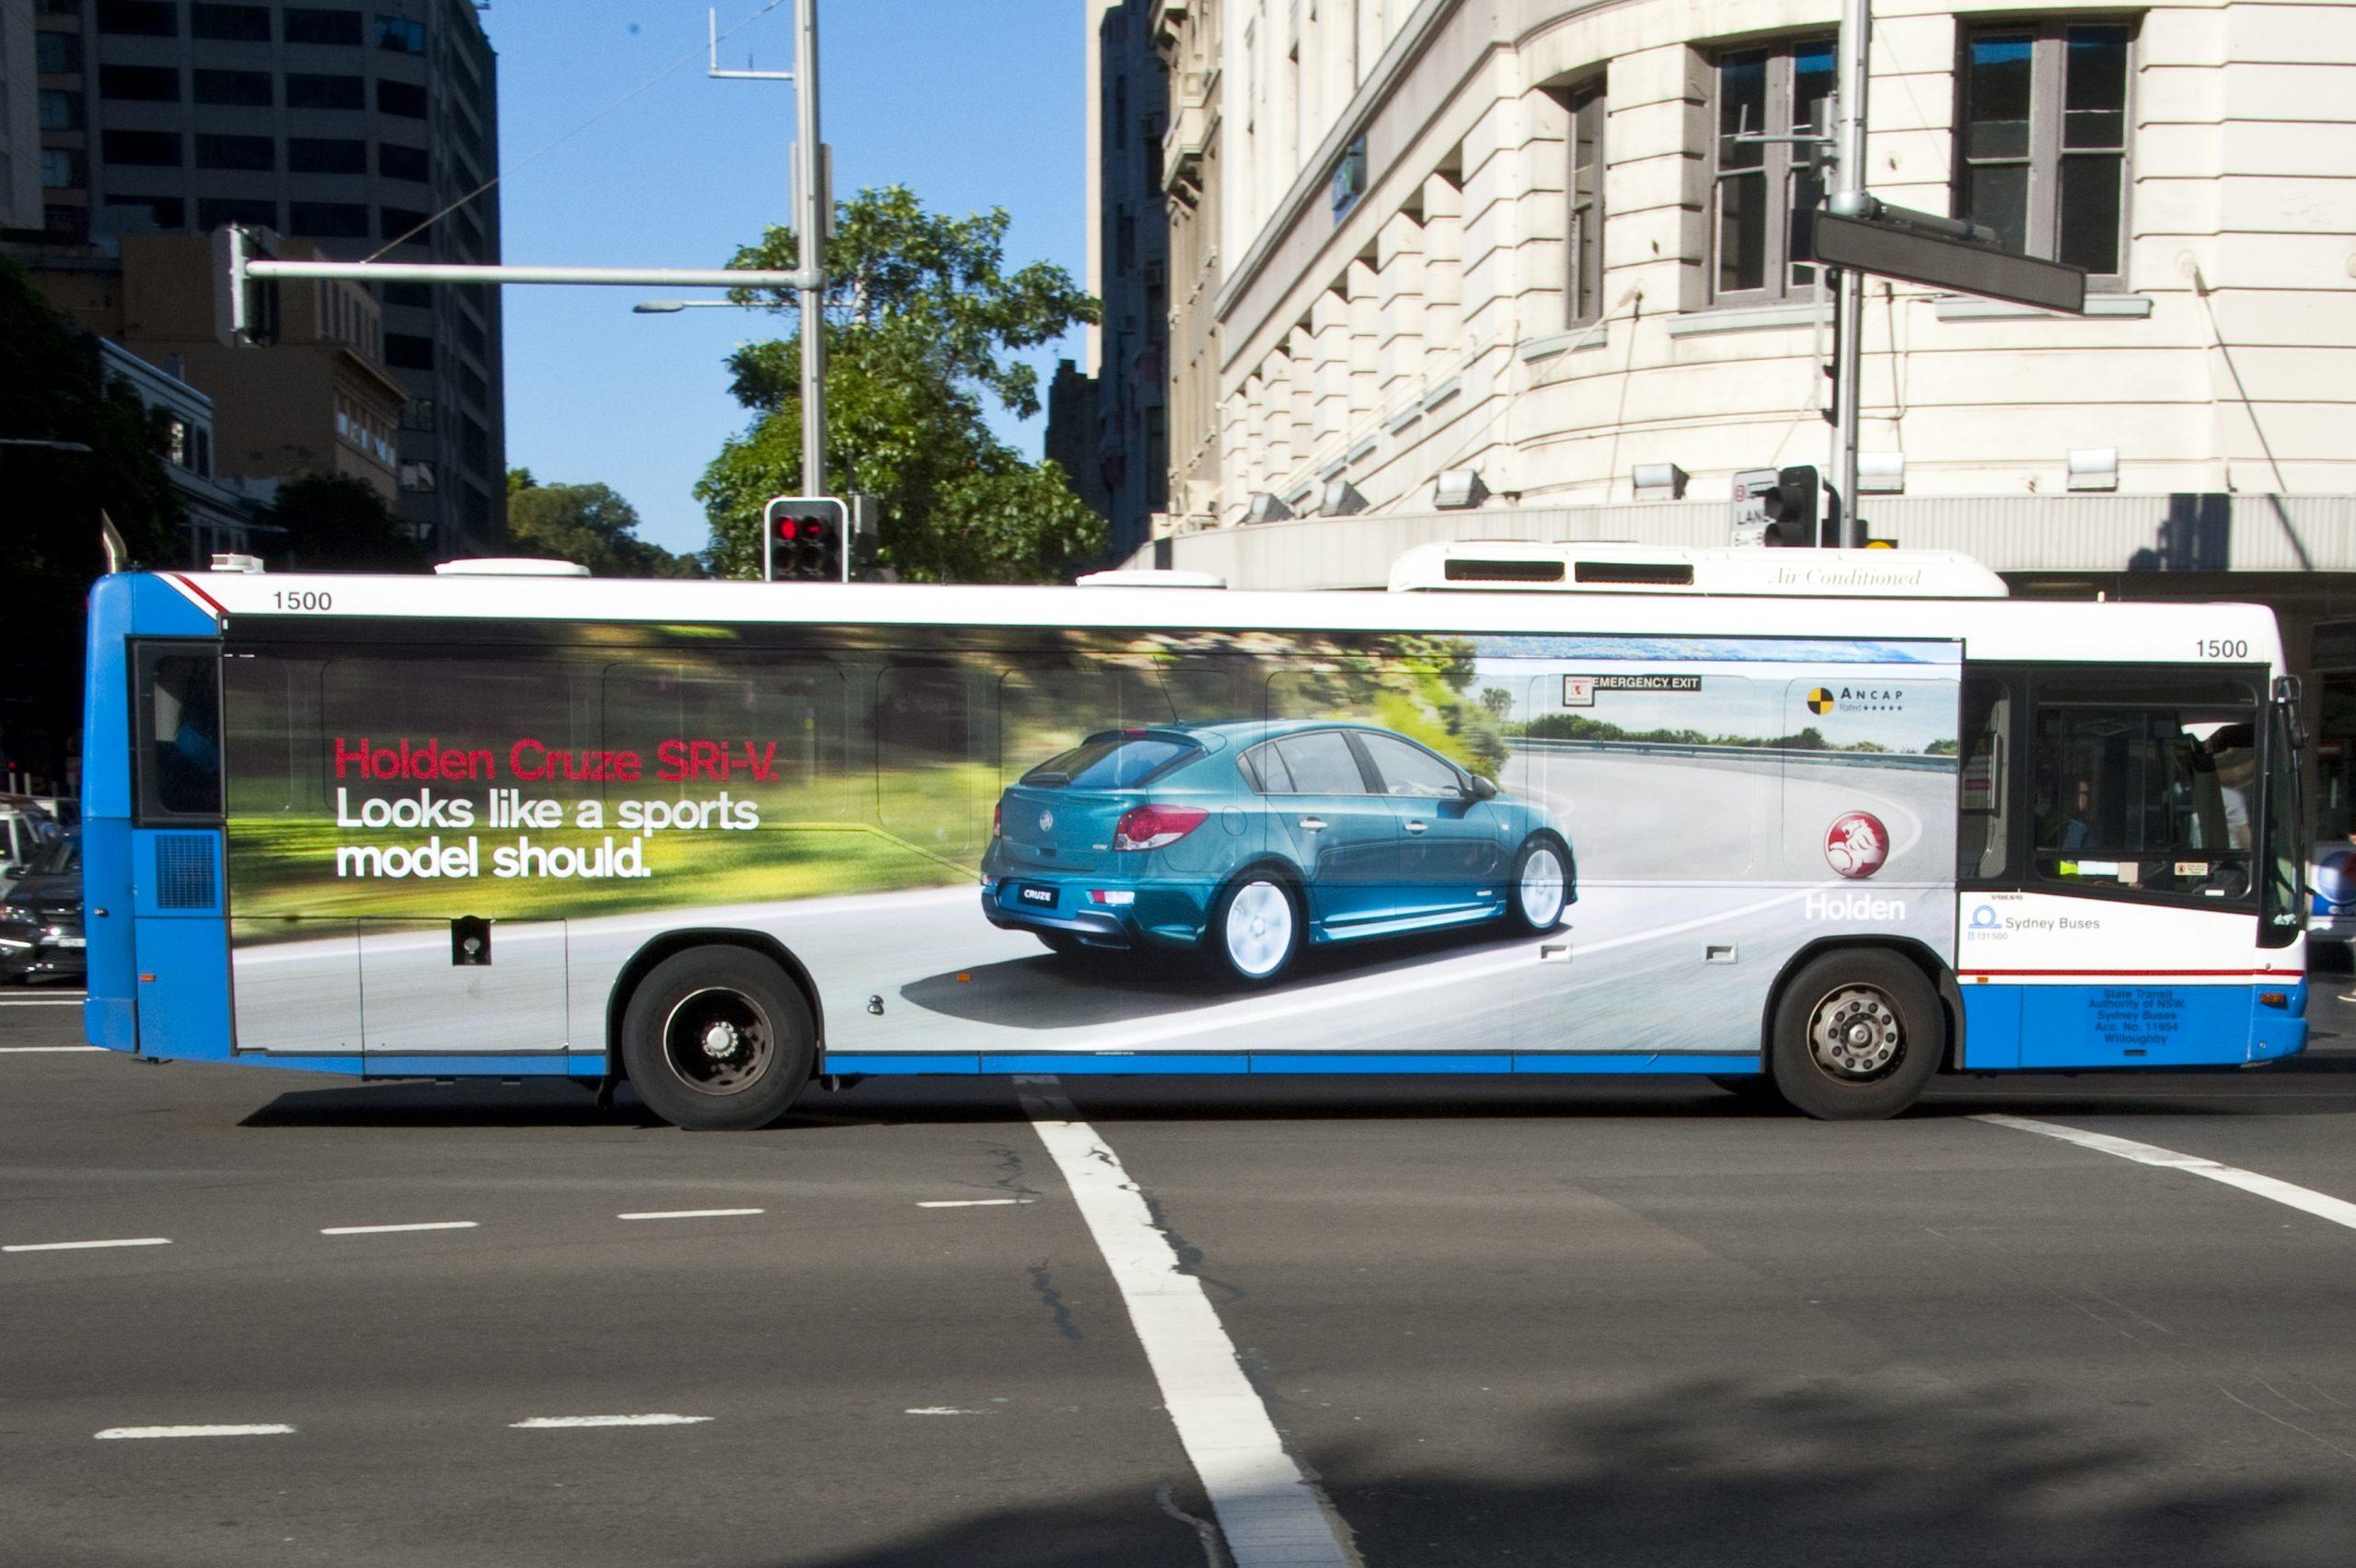 Roadside Giant Transit Advert On Bus